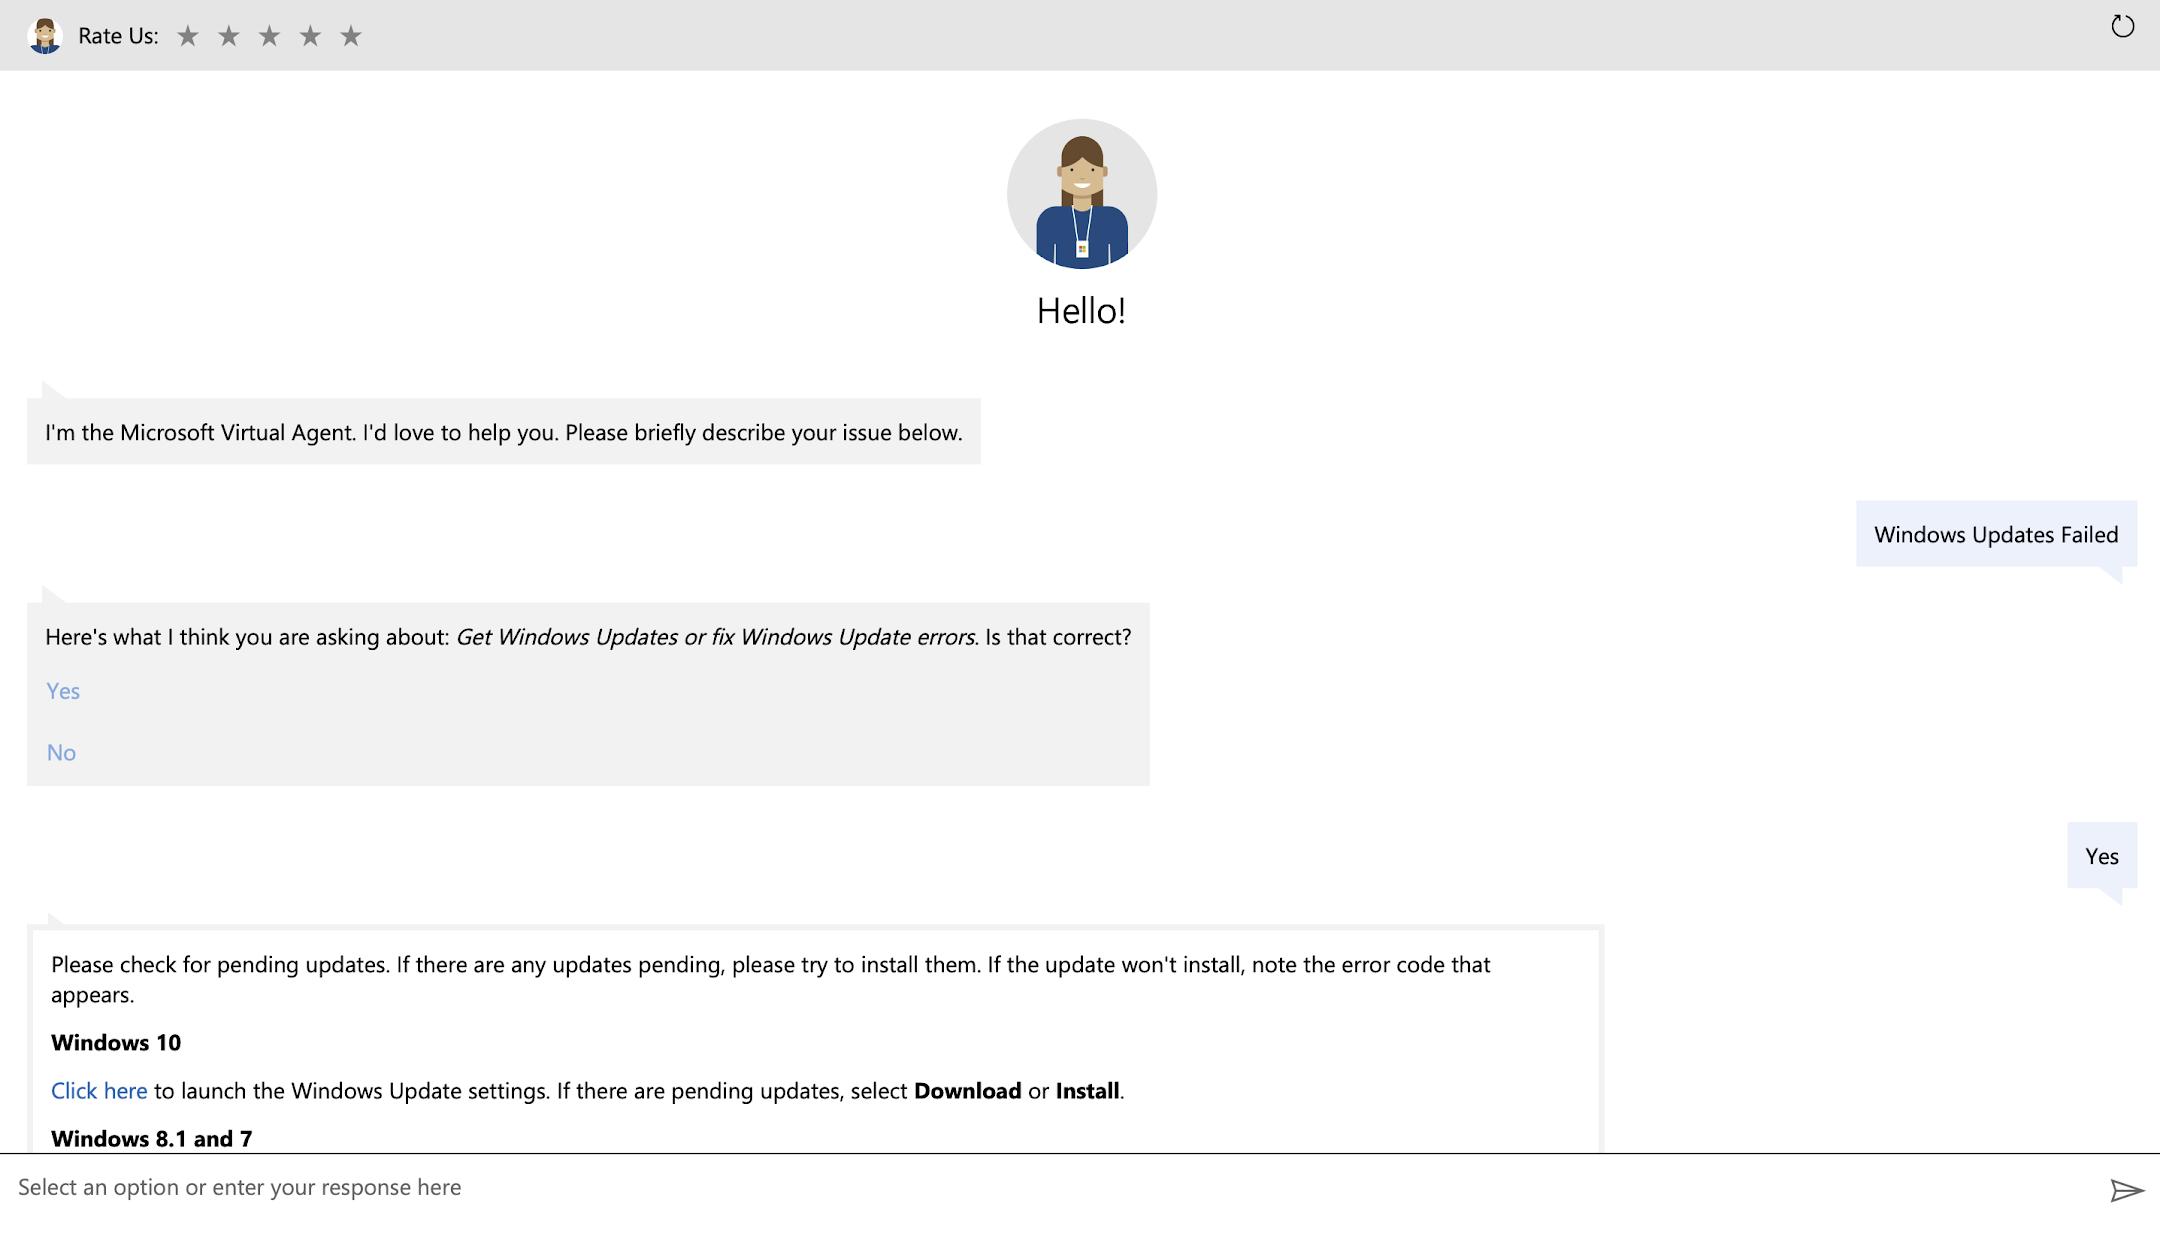 AskMicrosoft Virtual Agent for how to fix Windows updates failed